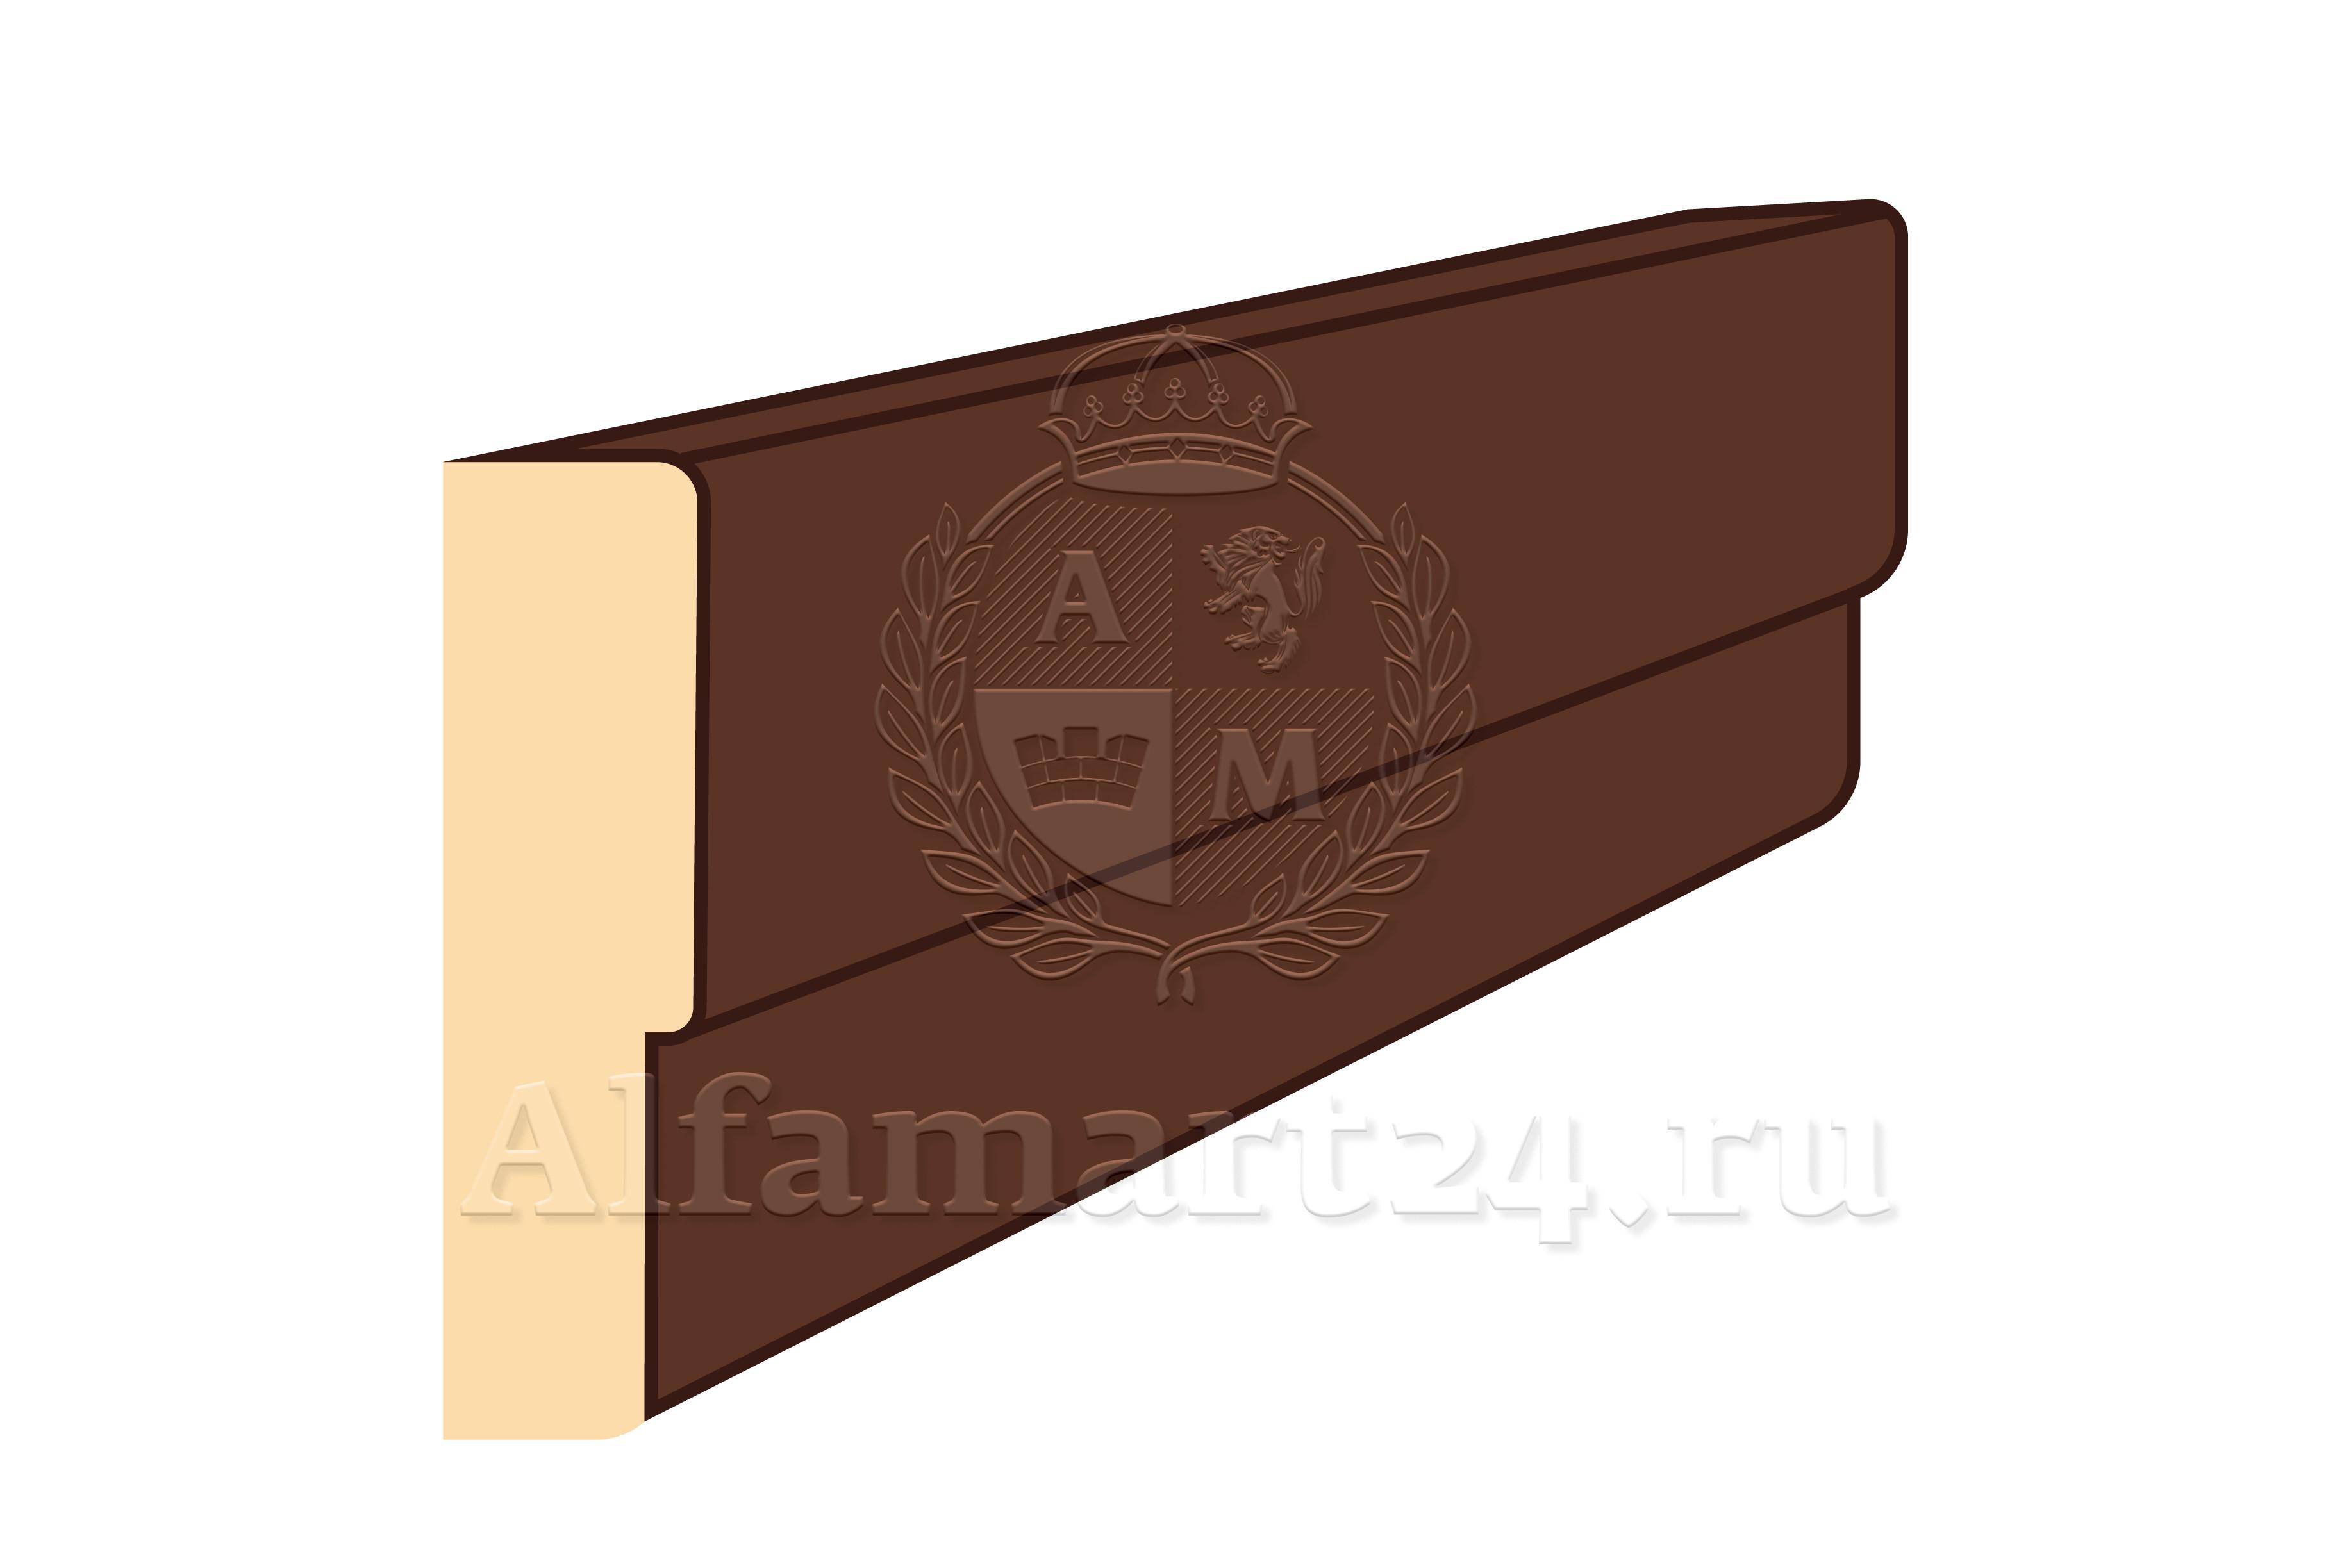 Дверная коробка перекладина М12,4, М13,4, М15,4 крашенная белая